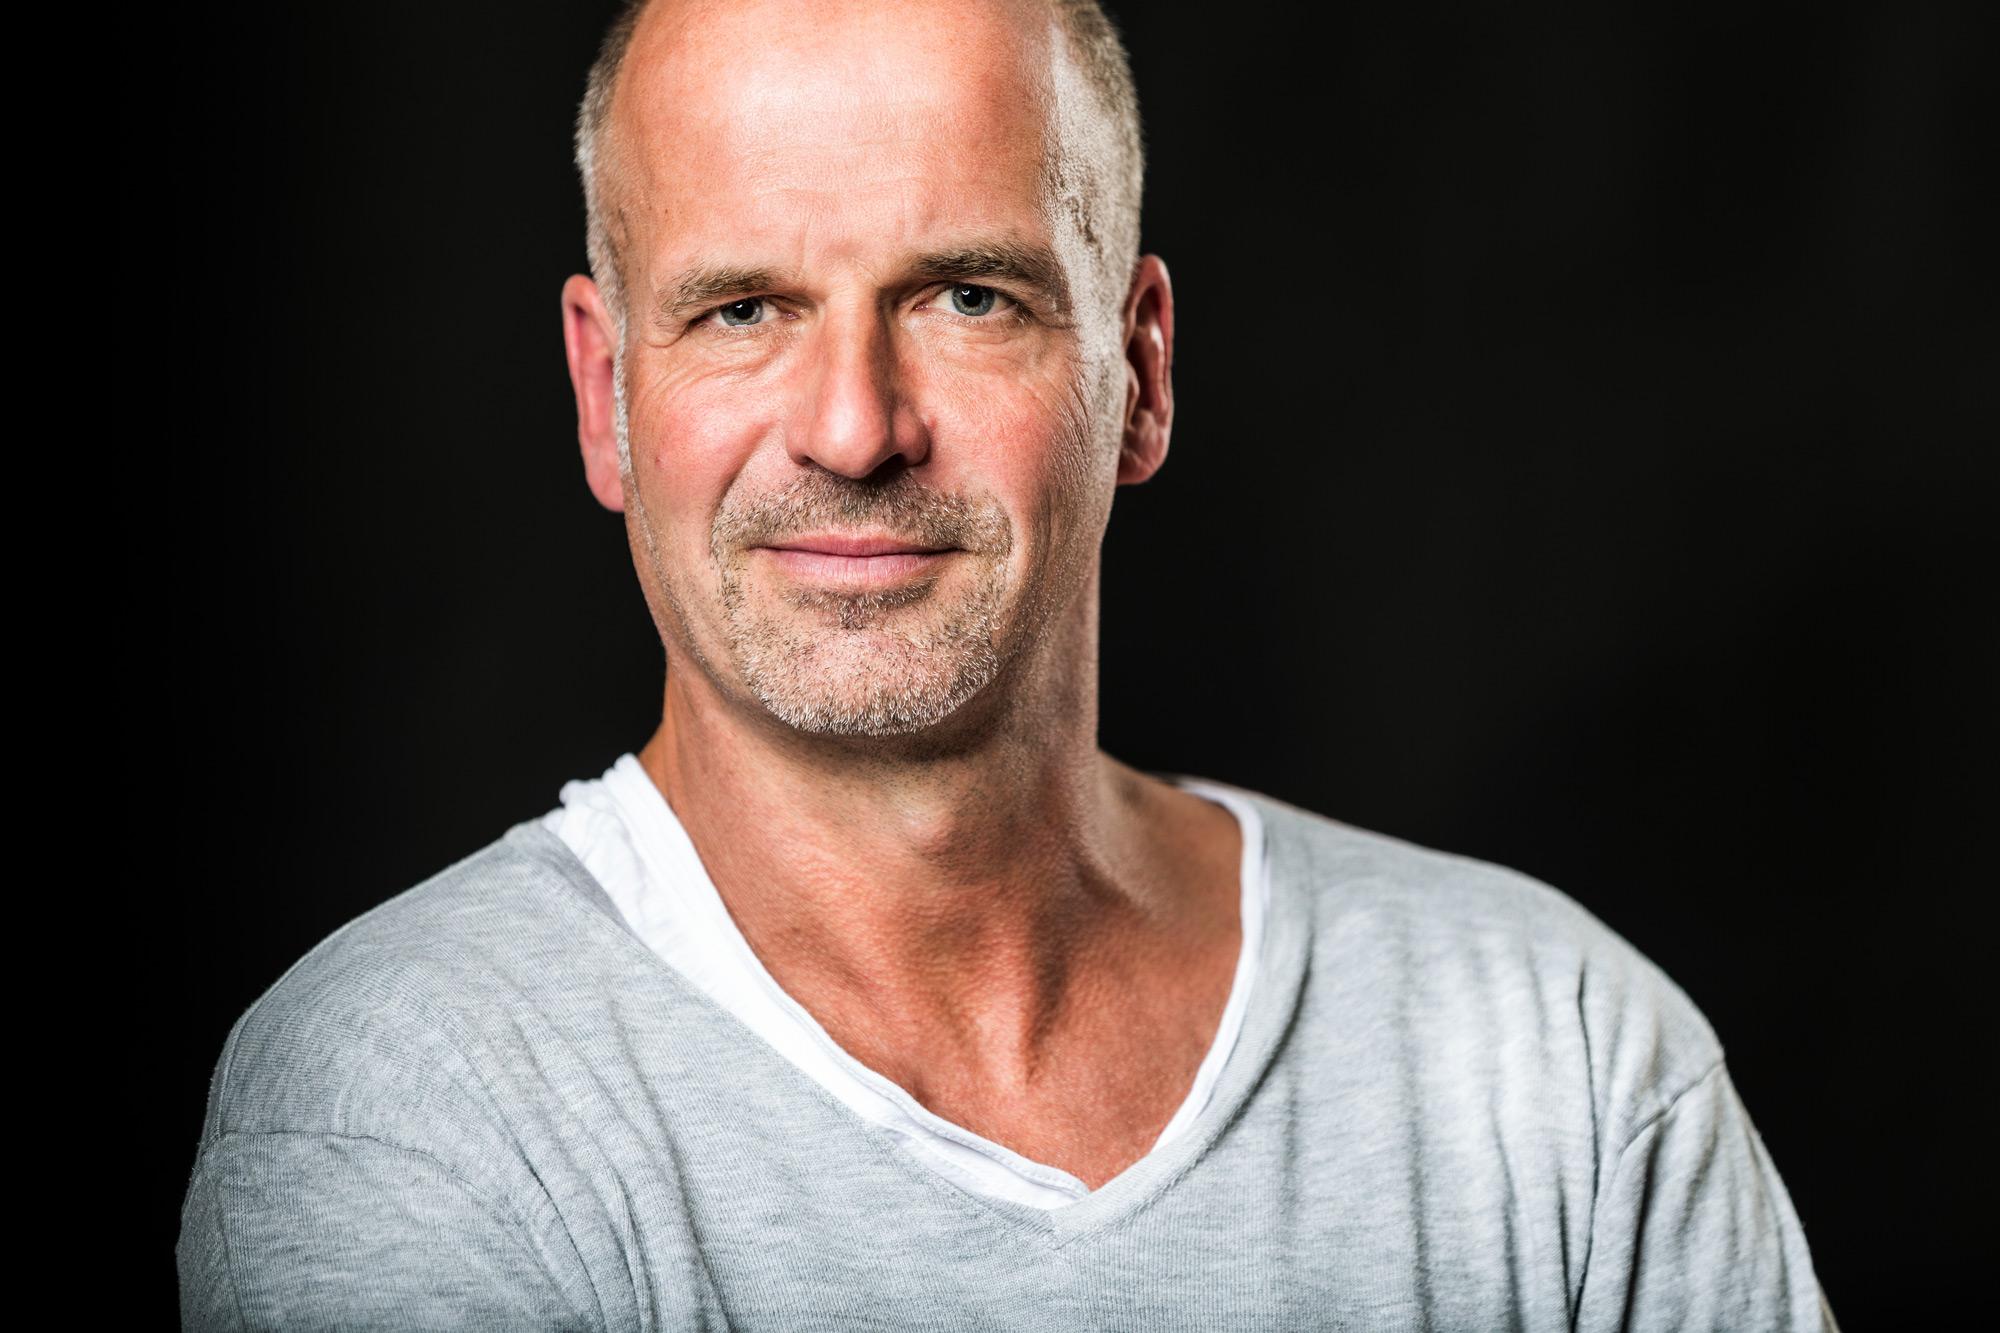 Fotograf Martin Miseré